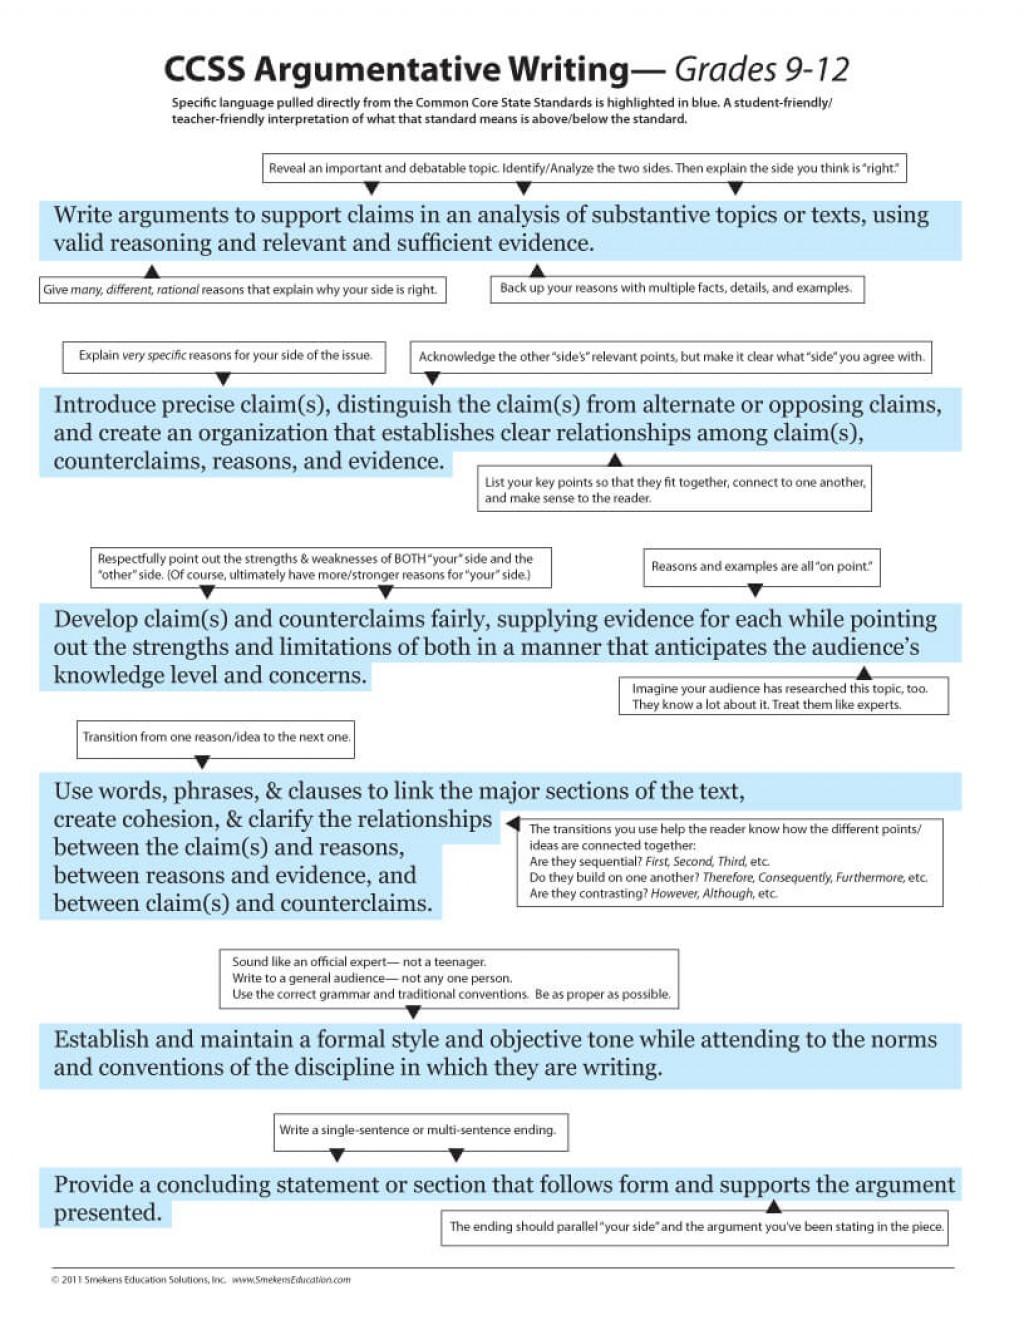 016 Essay Example Argumentative Persuasive Ccss Grade 9 Impressive Ppt On Abortion Large